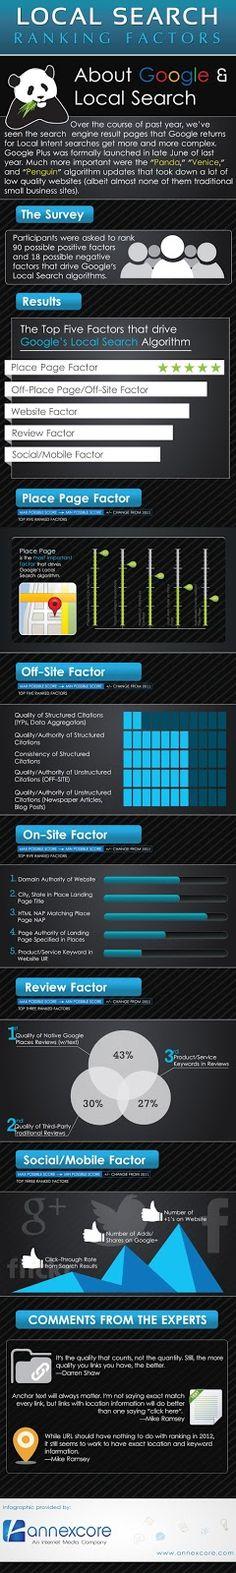 Local Search Ranking Factors #SEO #SEM http://arcreactions.com/